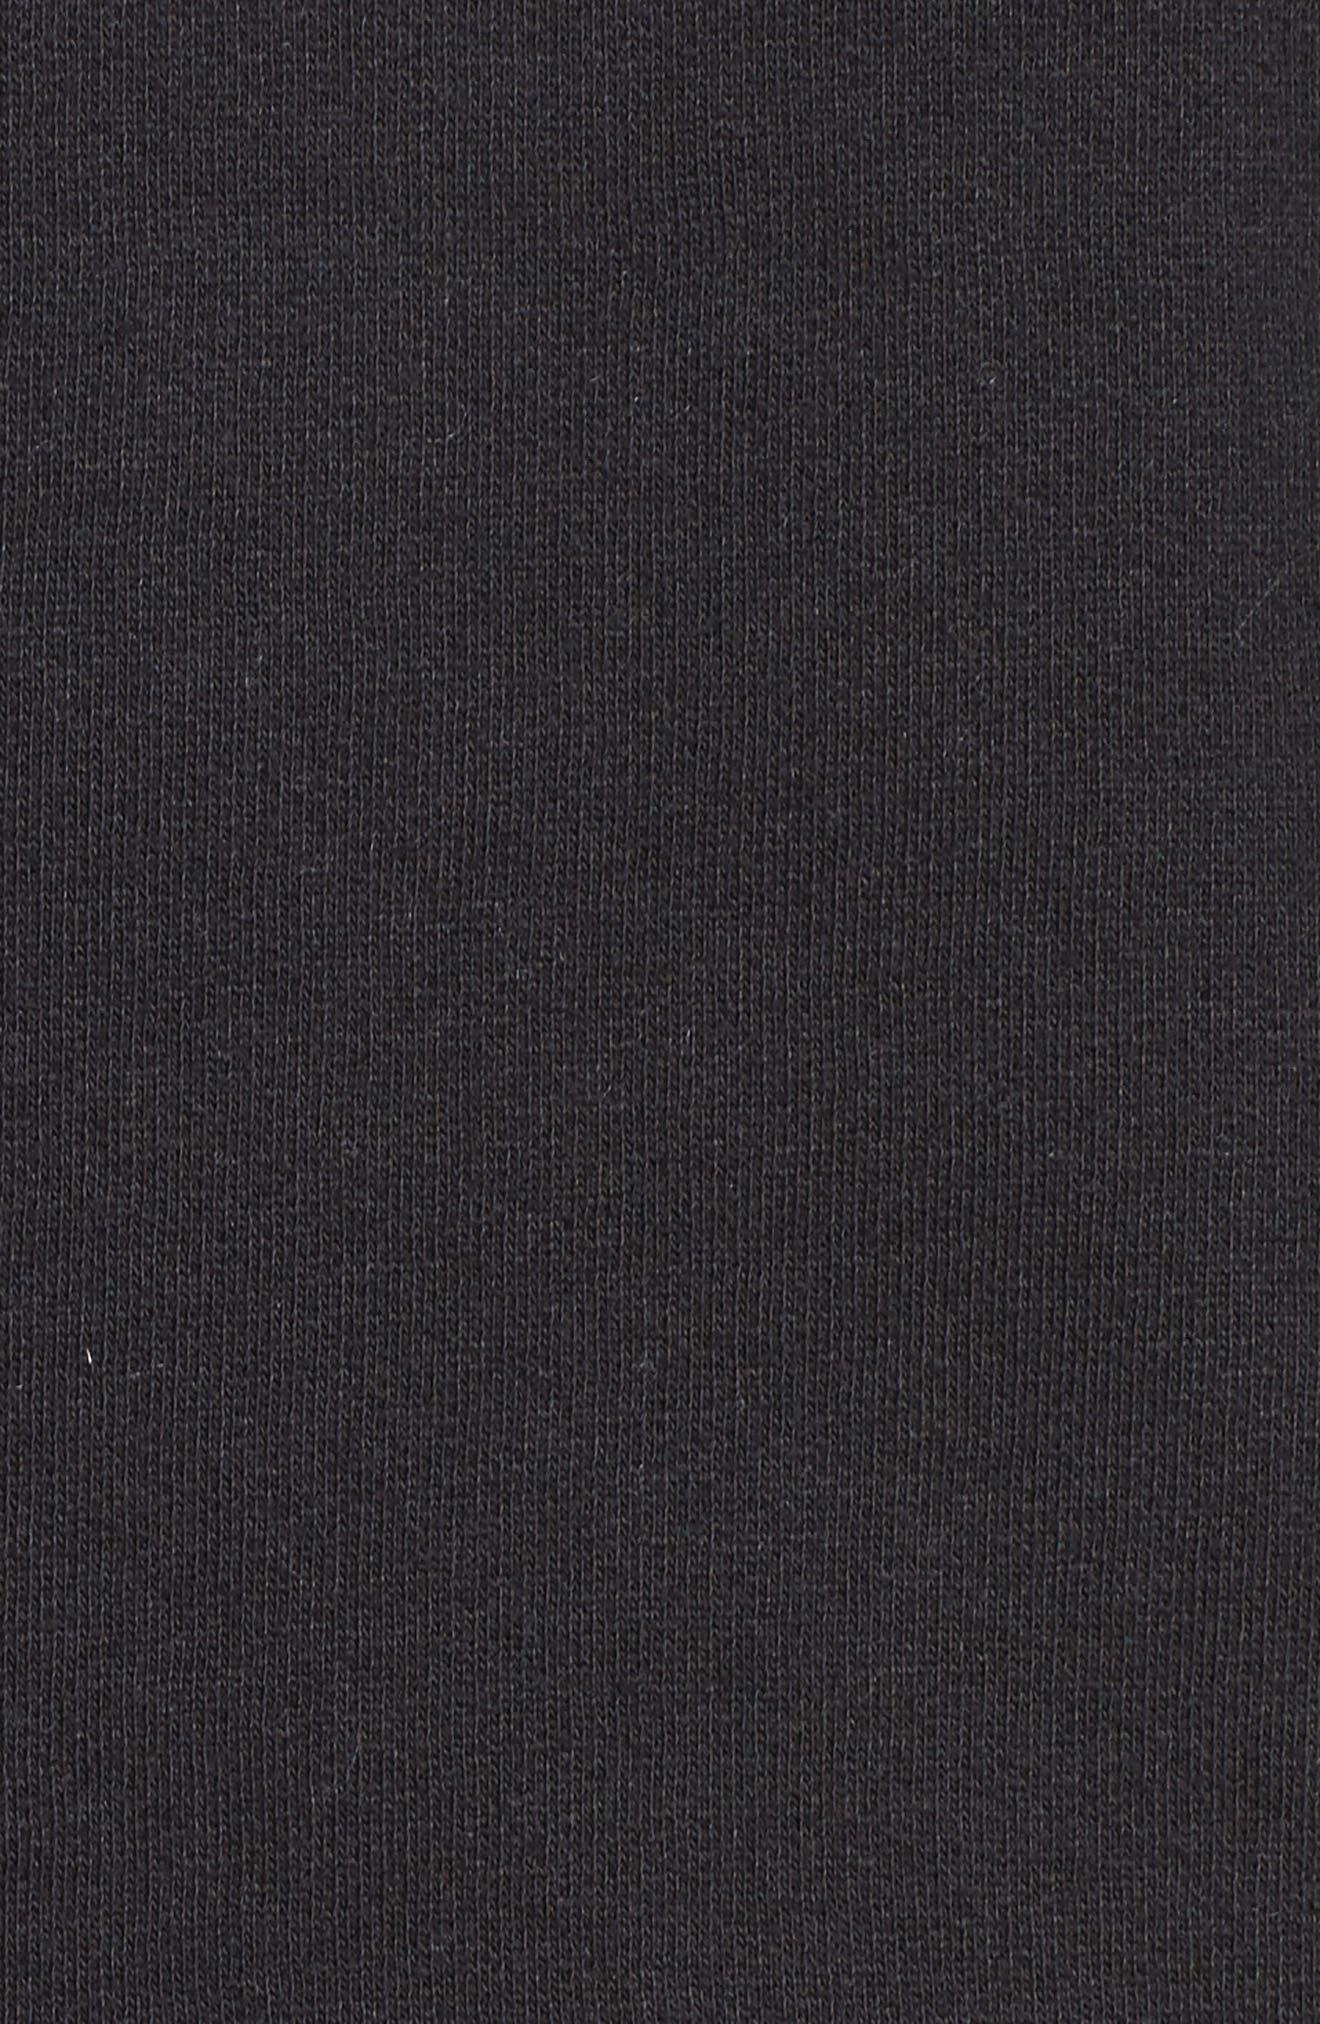 Brunette 'Coffee Now' Crewneck Sweatshirt,                             Alternate thumbnail 5, color,                             Black